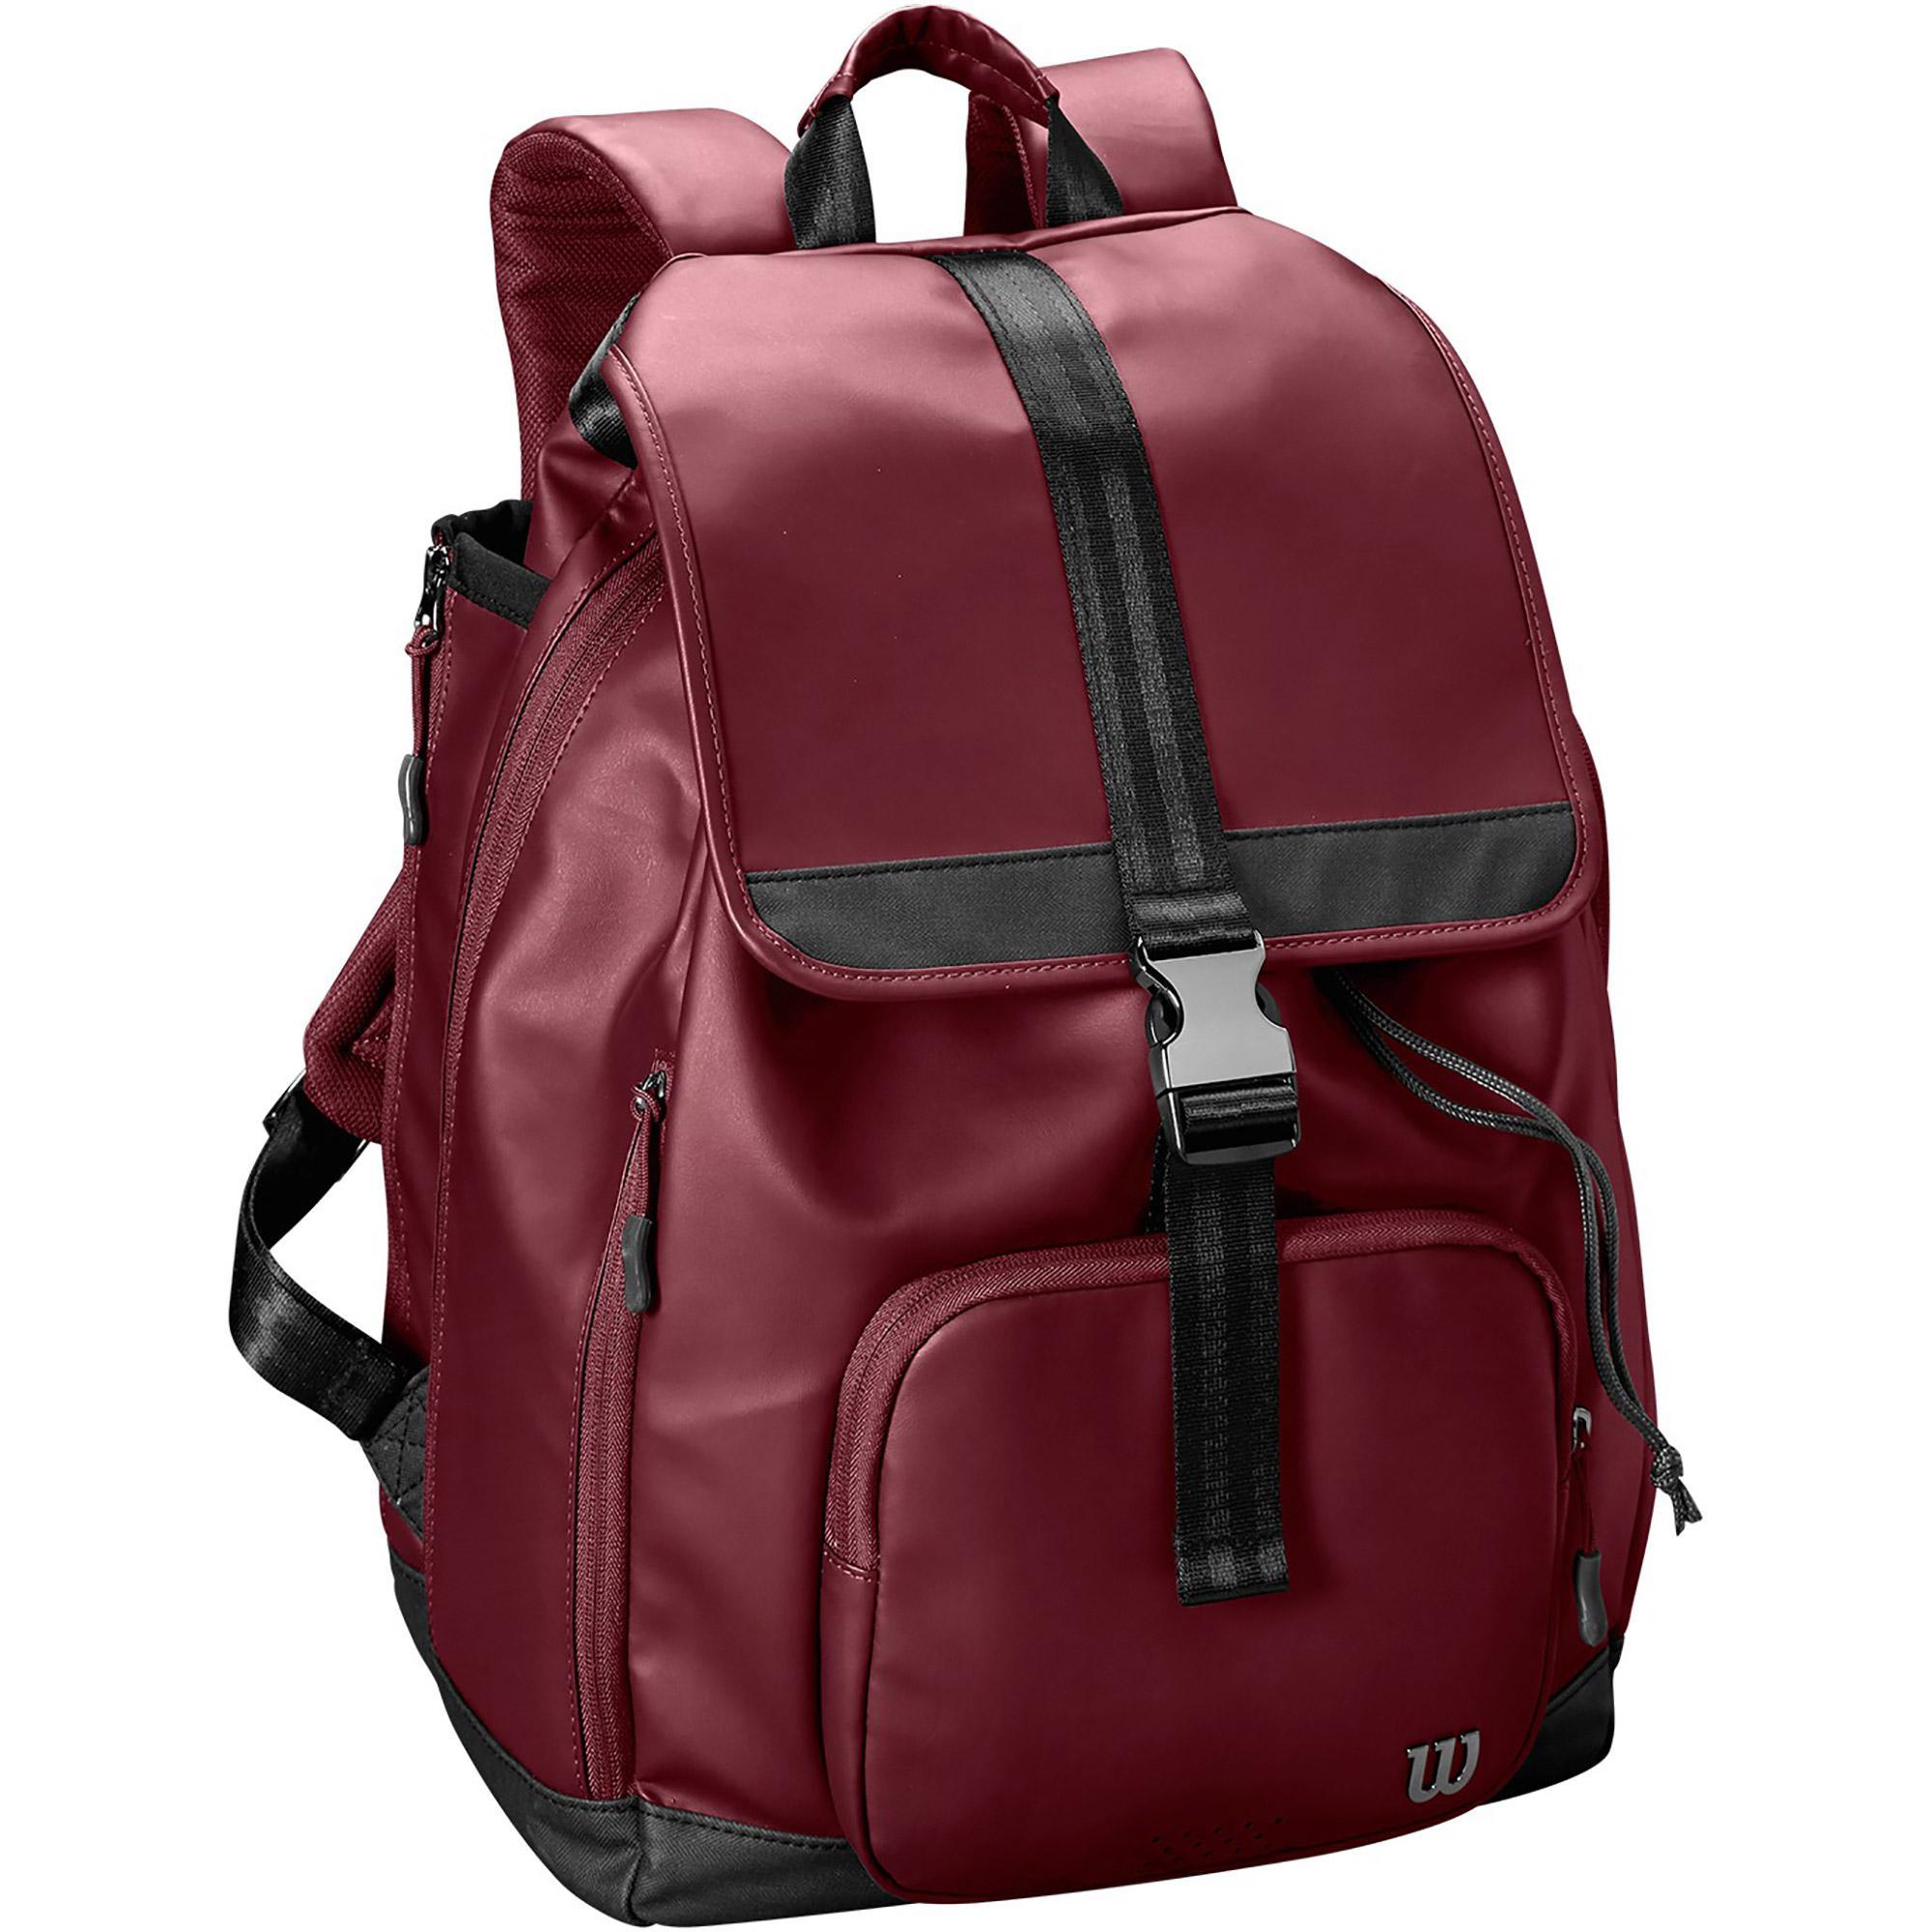 Wilson Womens Fold Over Backpack - Purple - Tennisnuts.com